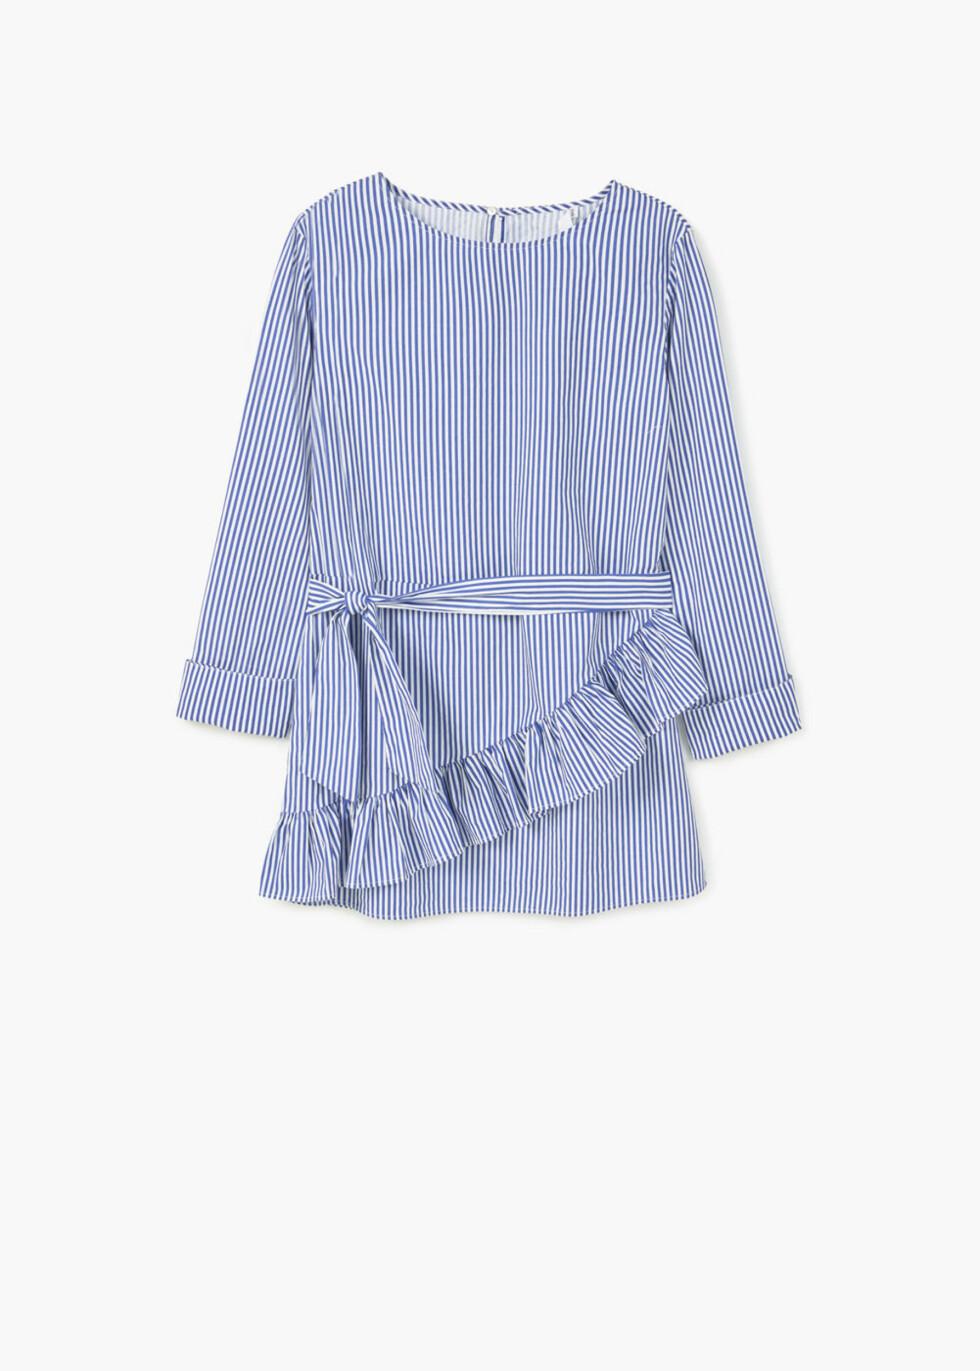 Skjorte fra Mango | kr 299 | http://shop.mango.com/NO/p1/damer/kl%C3%A6r/skjorter/bluser/stripet-skjorte-i-poplin?id=73068815_52&n=1&s=prendas.blusas&ts=1475835157967